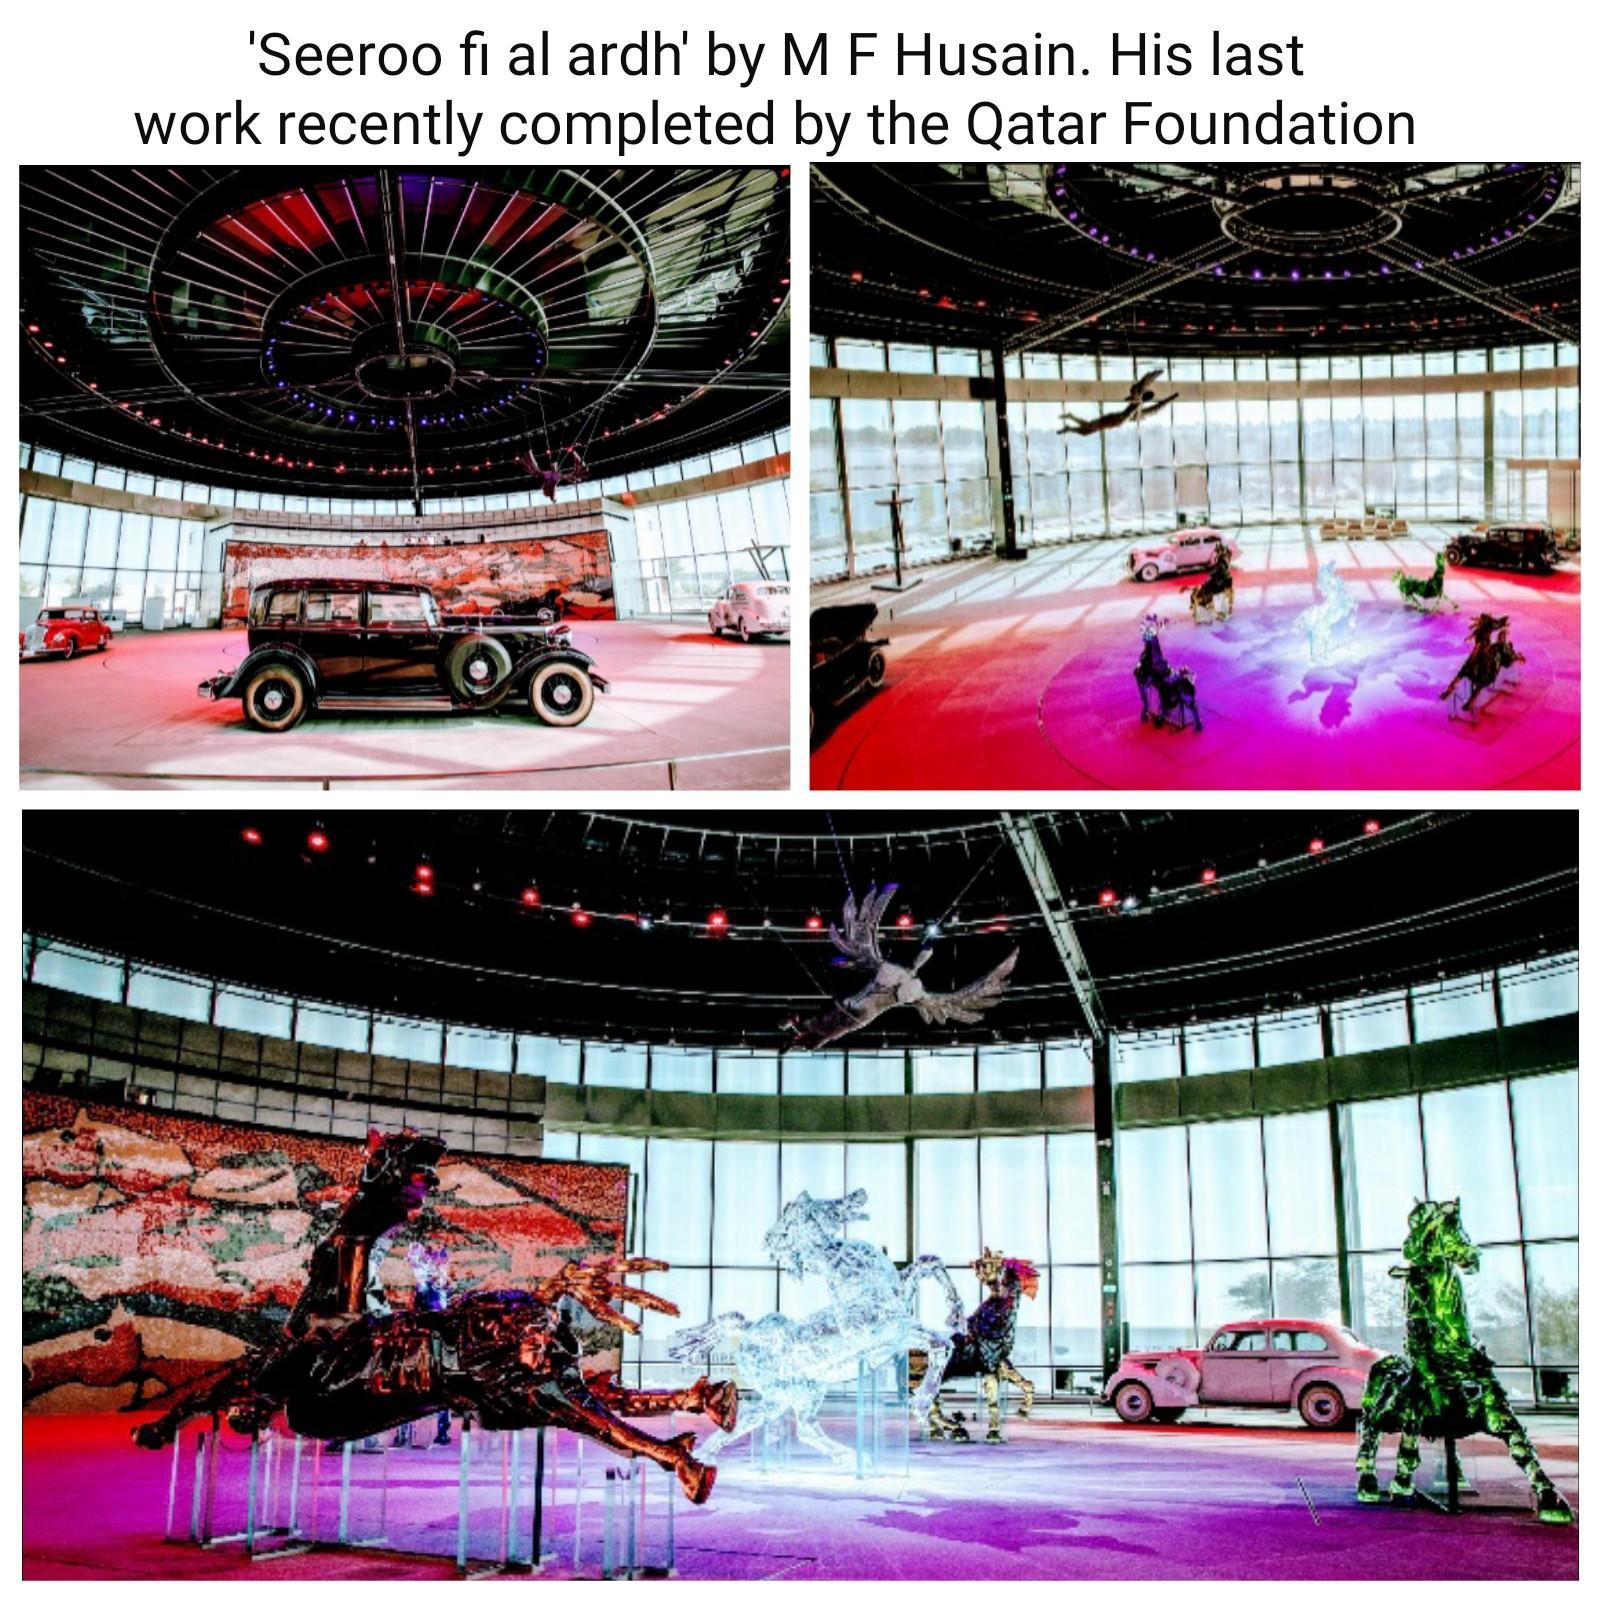 MF Hussain's final hurrah